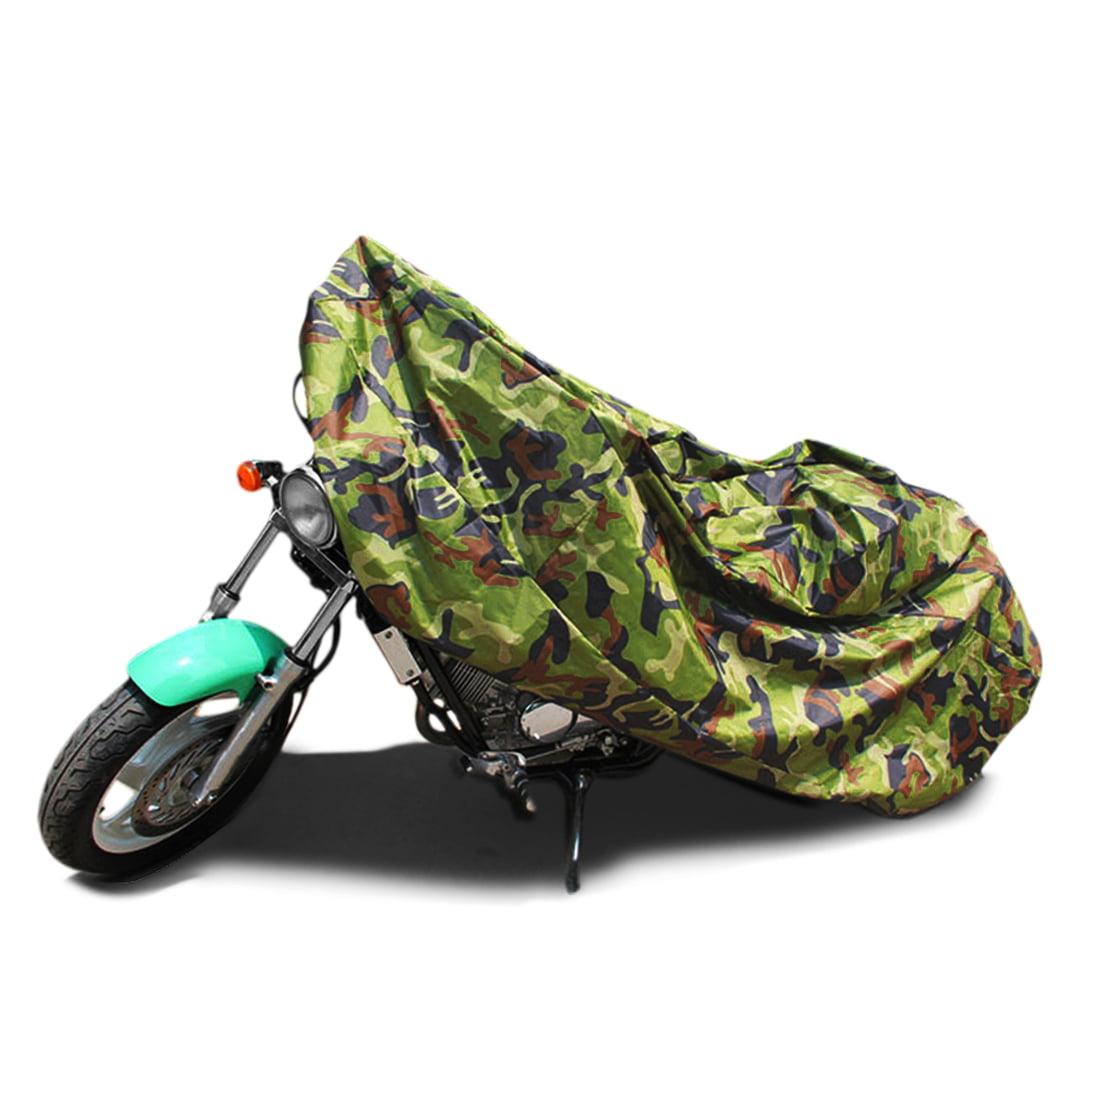 XXXL 190T Rain Dust Motorcycle Cover Camouflage Outdoor Waterproof